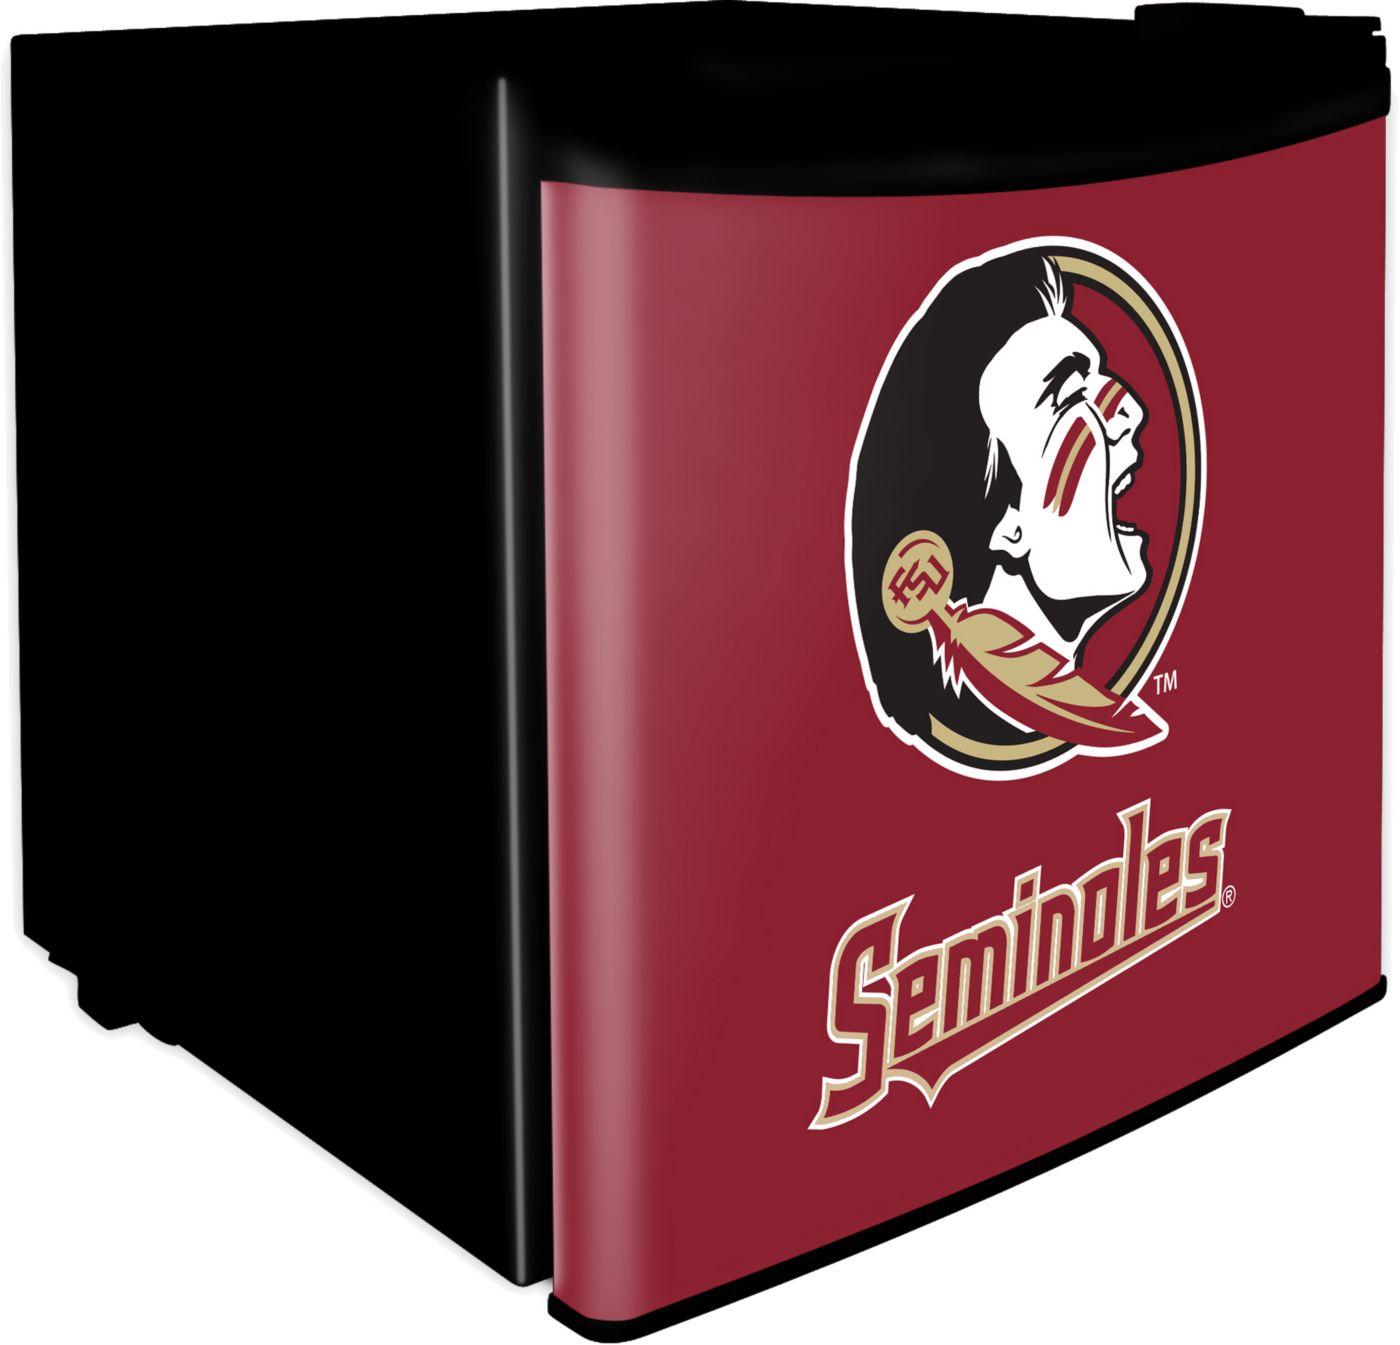 Boelter Florida State Seminoles Dorm Room Refrigerator